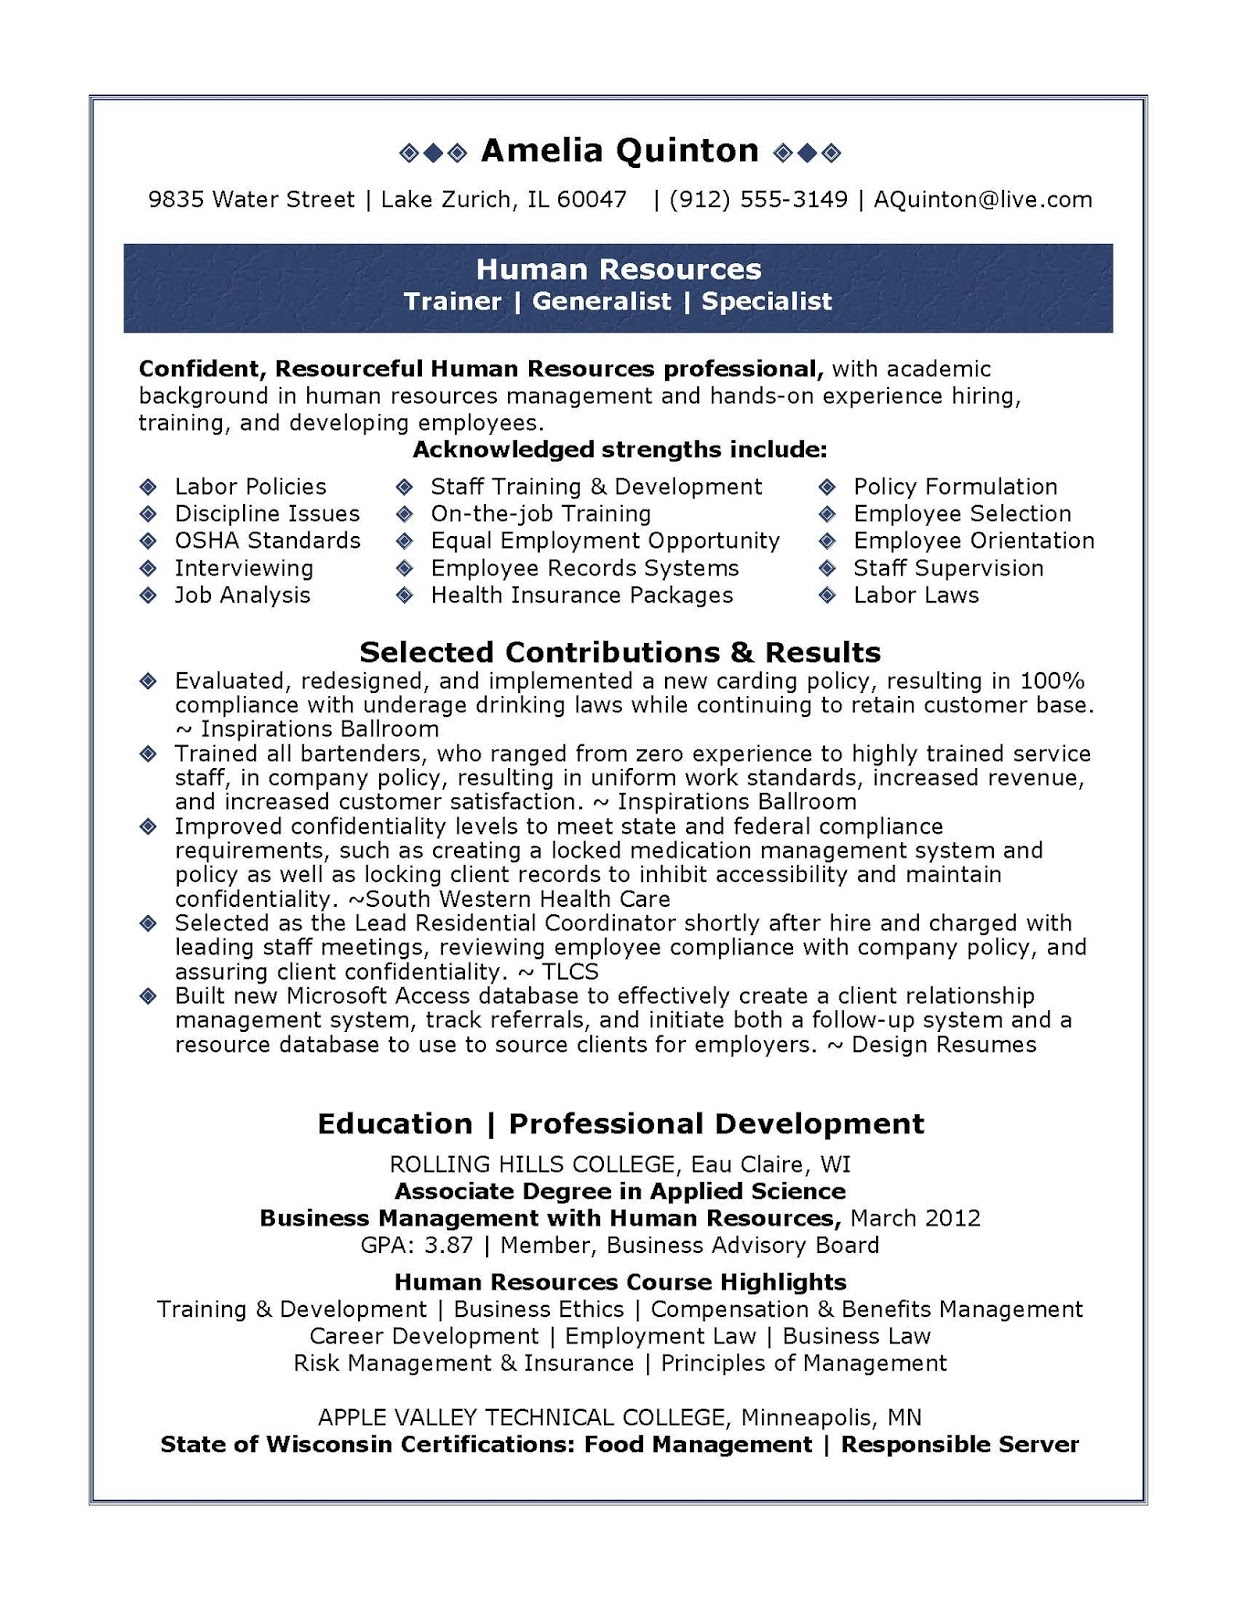 online advertising specialist sample resume online advertising specialist sample resume - Online Advertising Specialist